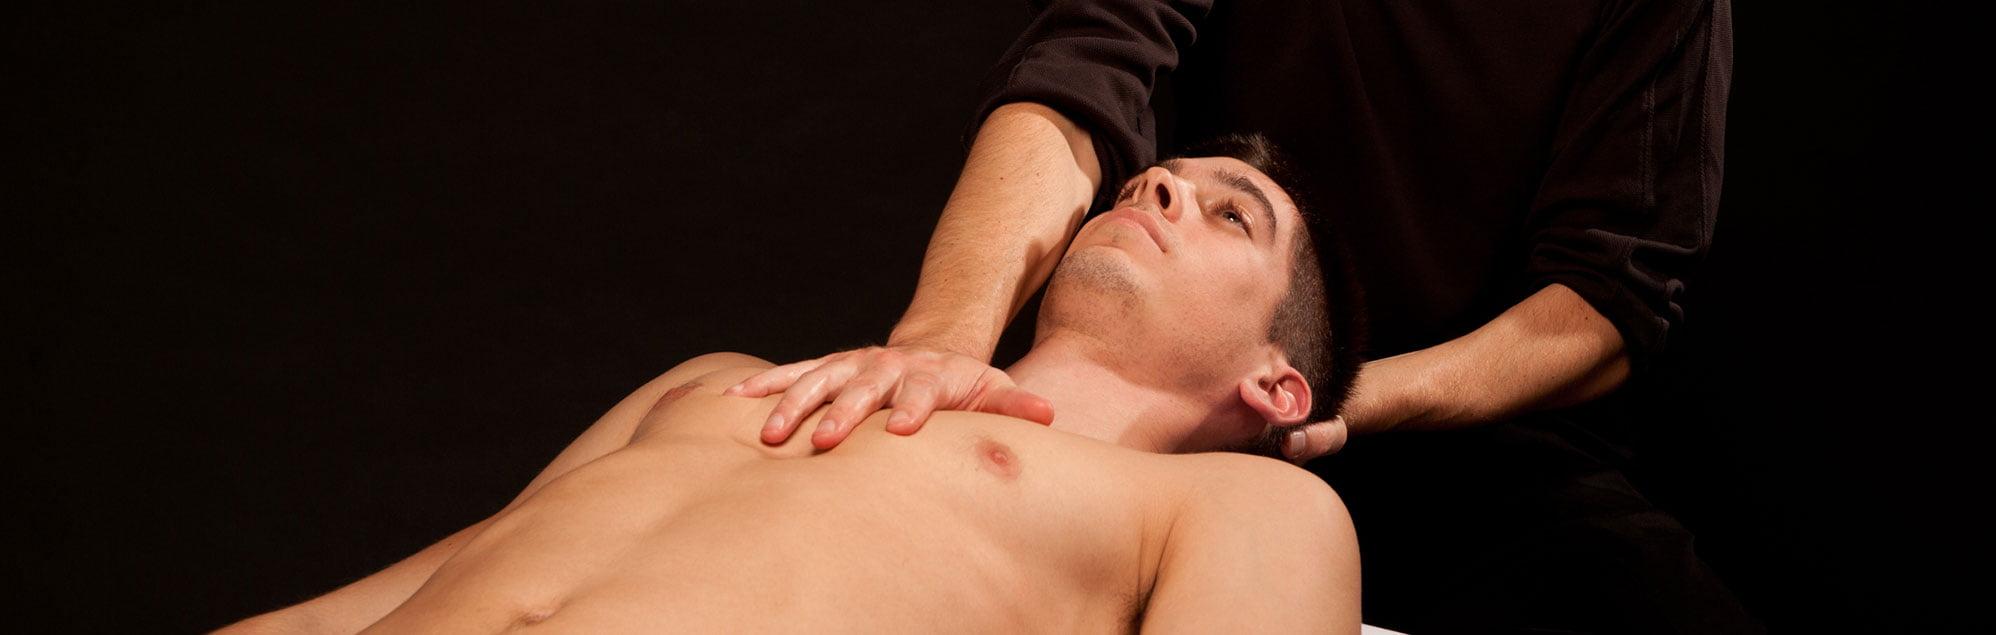 Centre-TMO-physiotherapie-osteopathie-massotherapie-Gatineau-Hull-MGP_5021